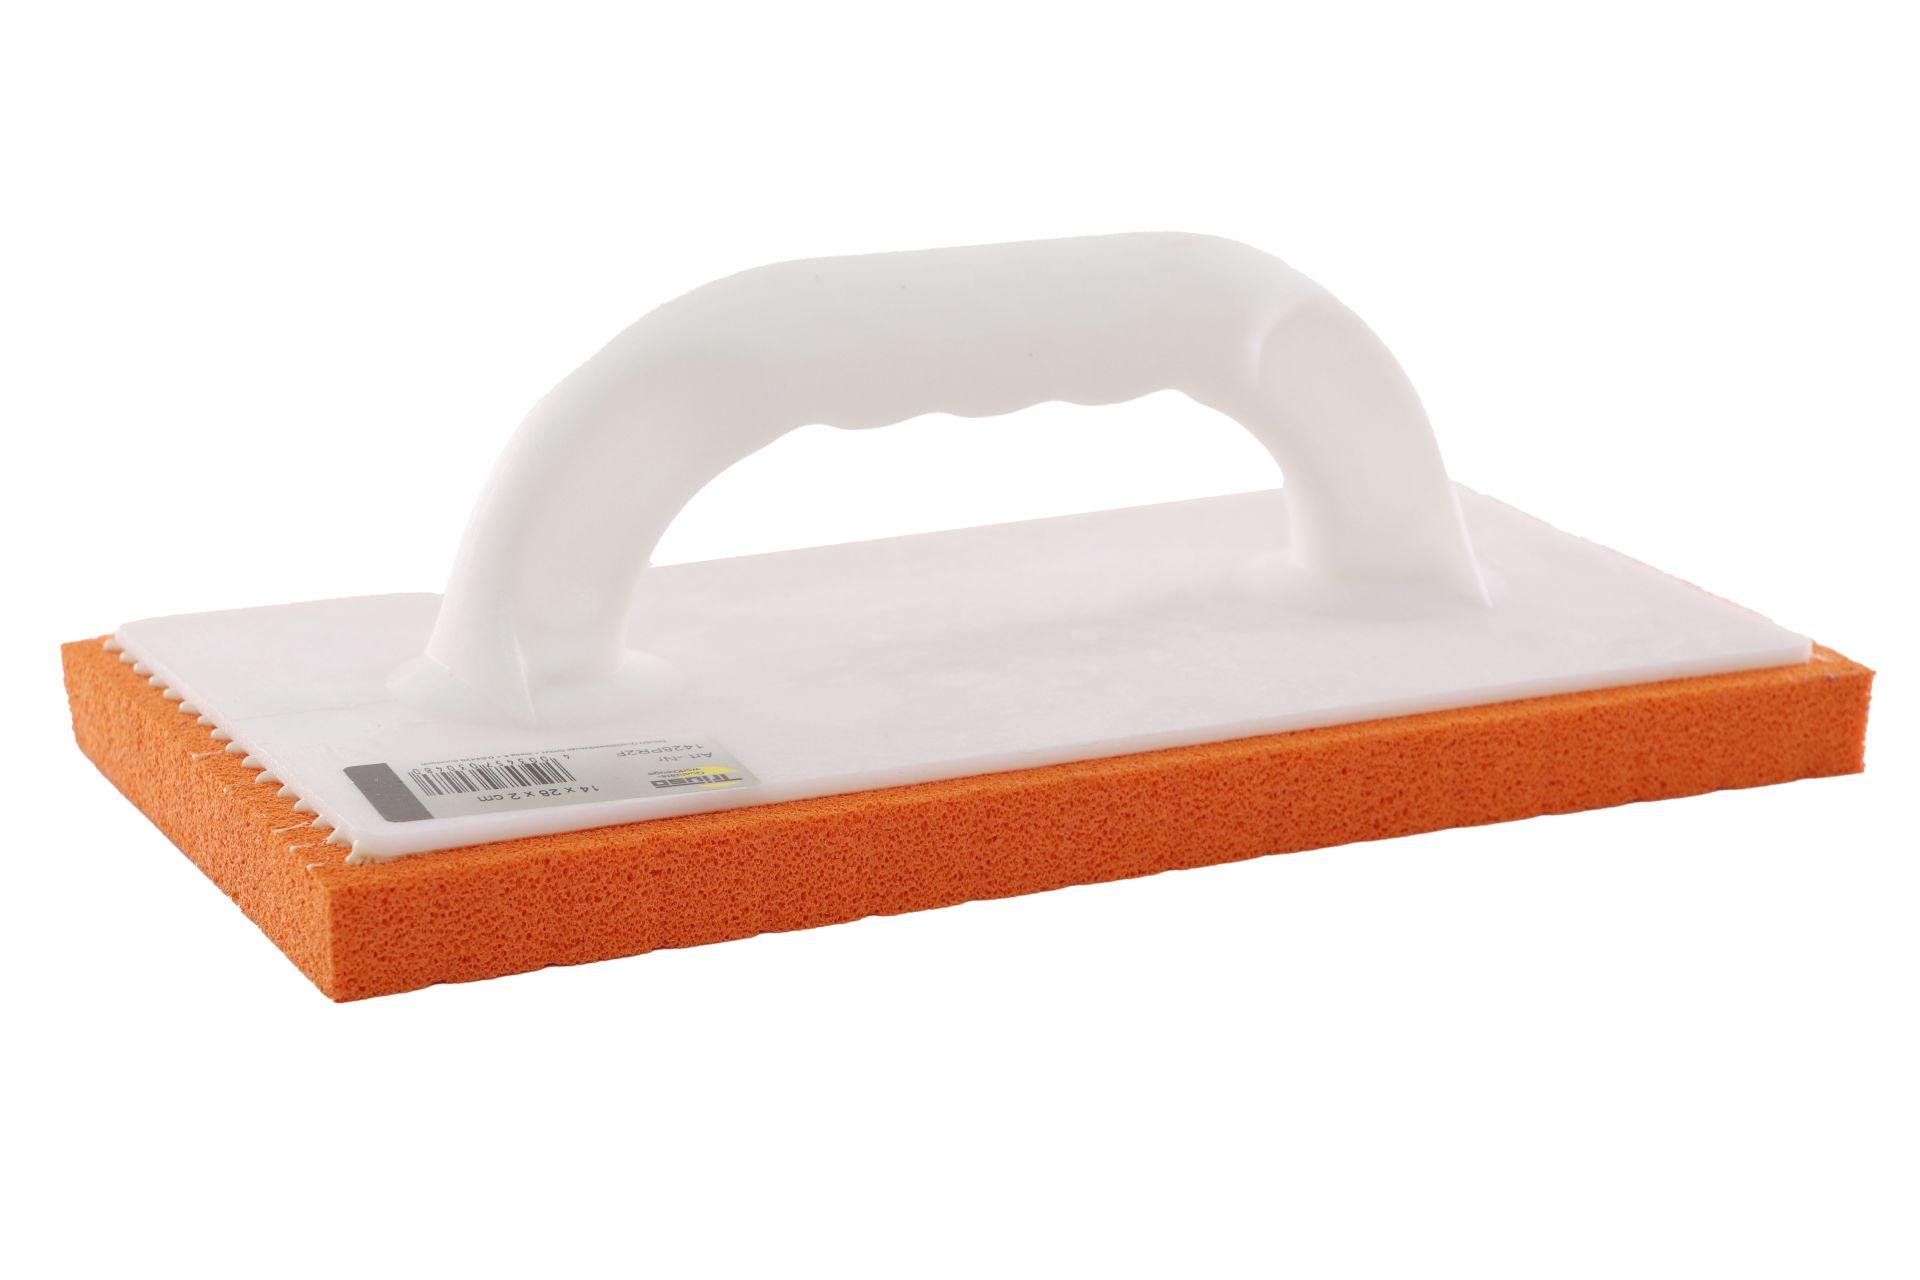 TRIUSO Kunststoff-Reibebrett mit 20 mm feinporigem rotem Belag, 140 x 280 mm